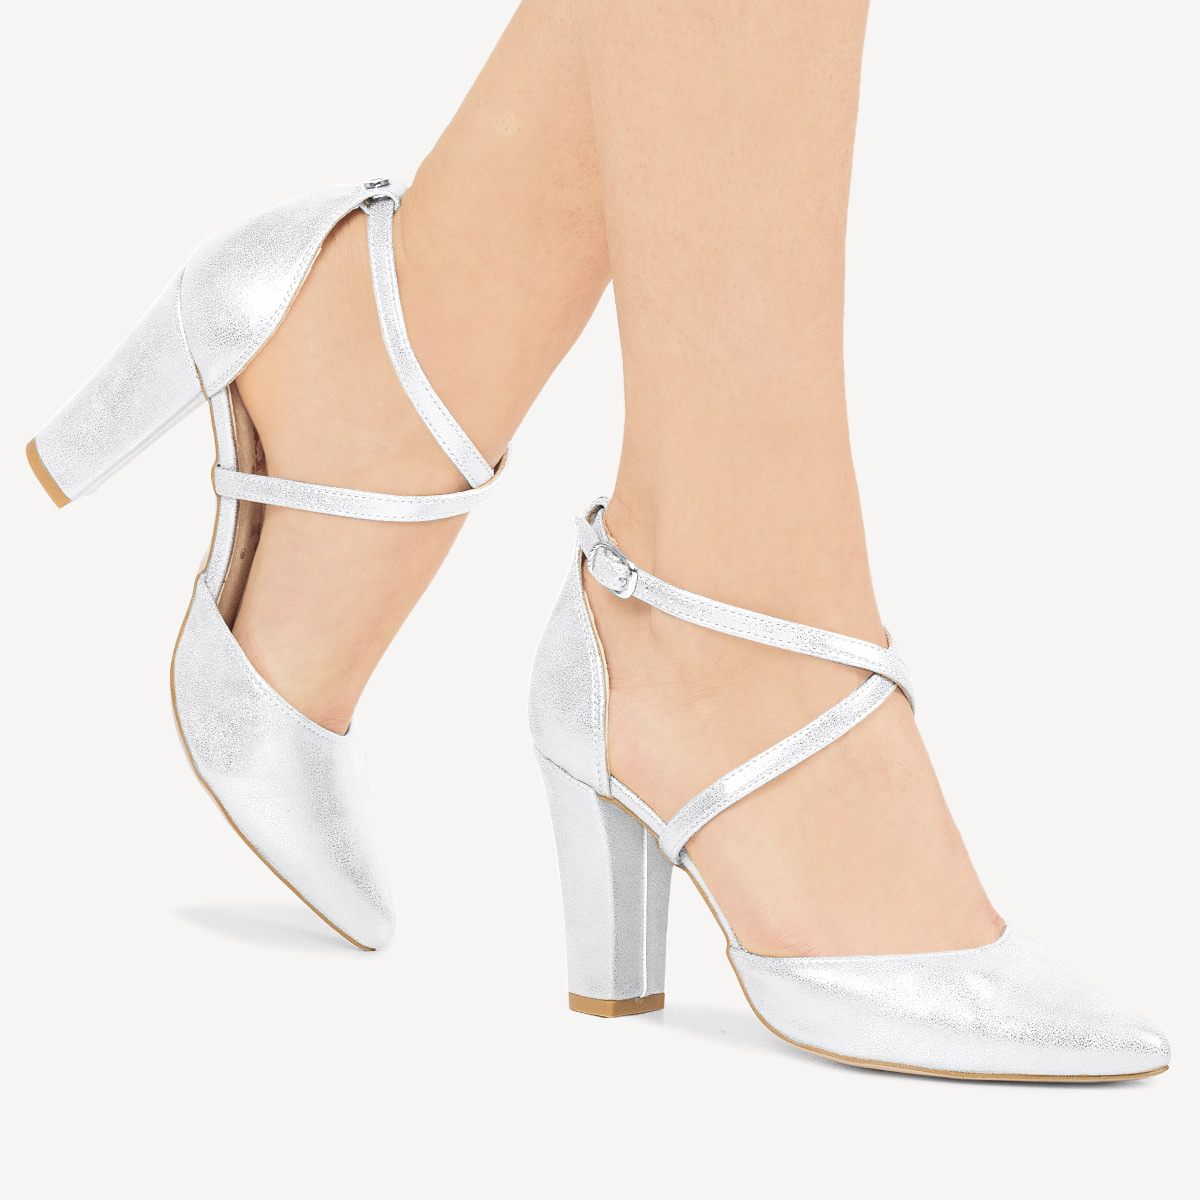 Czolenka Na Slupku Szare Nf 27 Grey Stiletto Heels Heels Stiletto